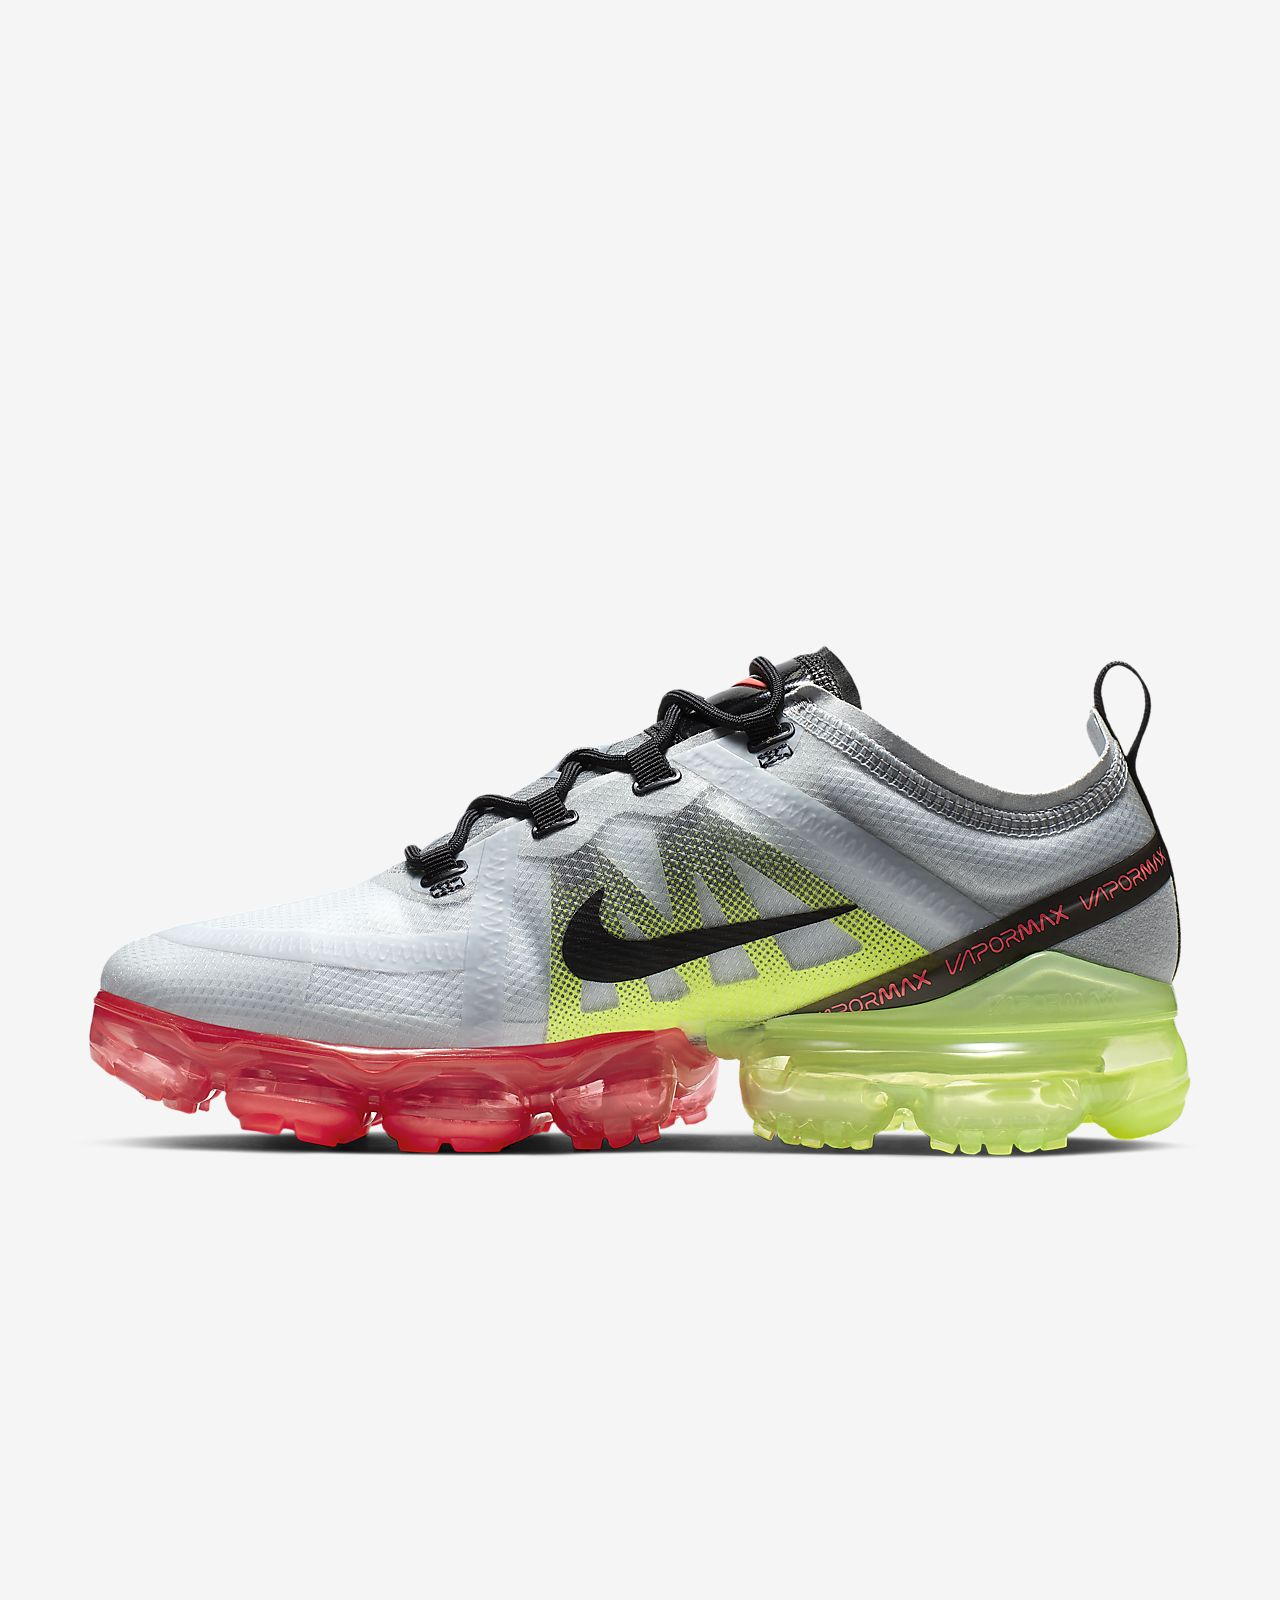 92c0d182a4 Calzado Nike Air VaporMax 2019. Nike.com CL